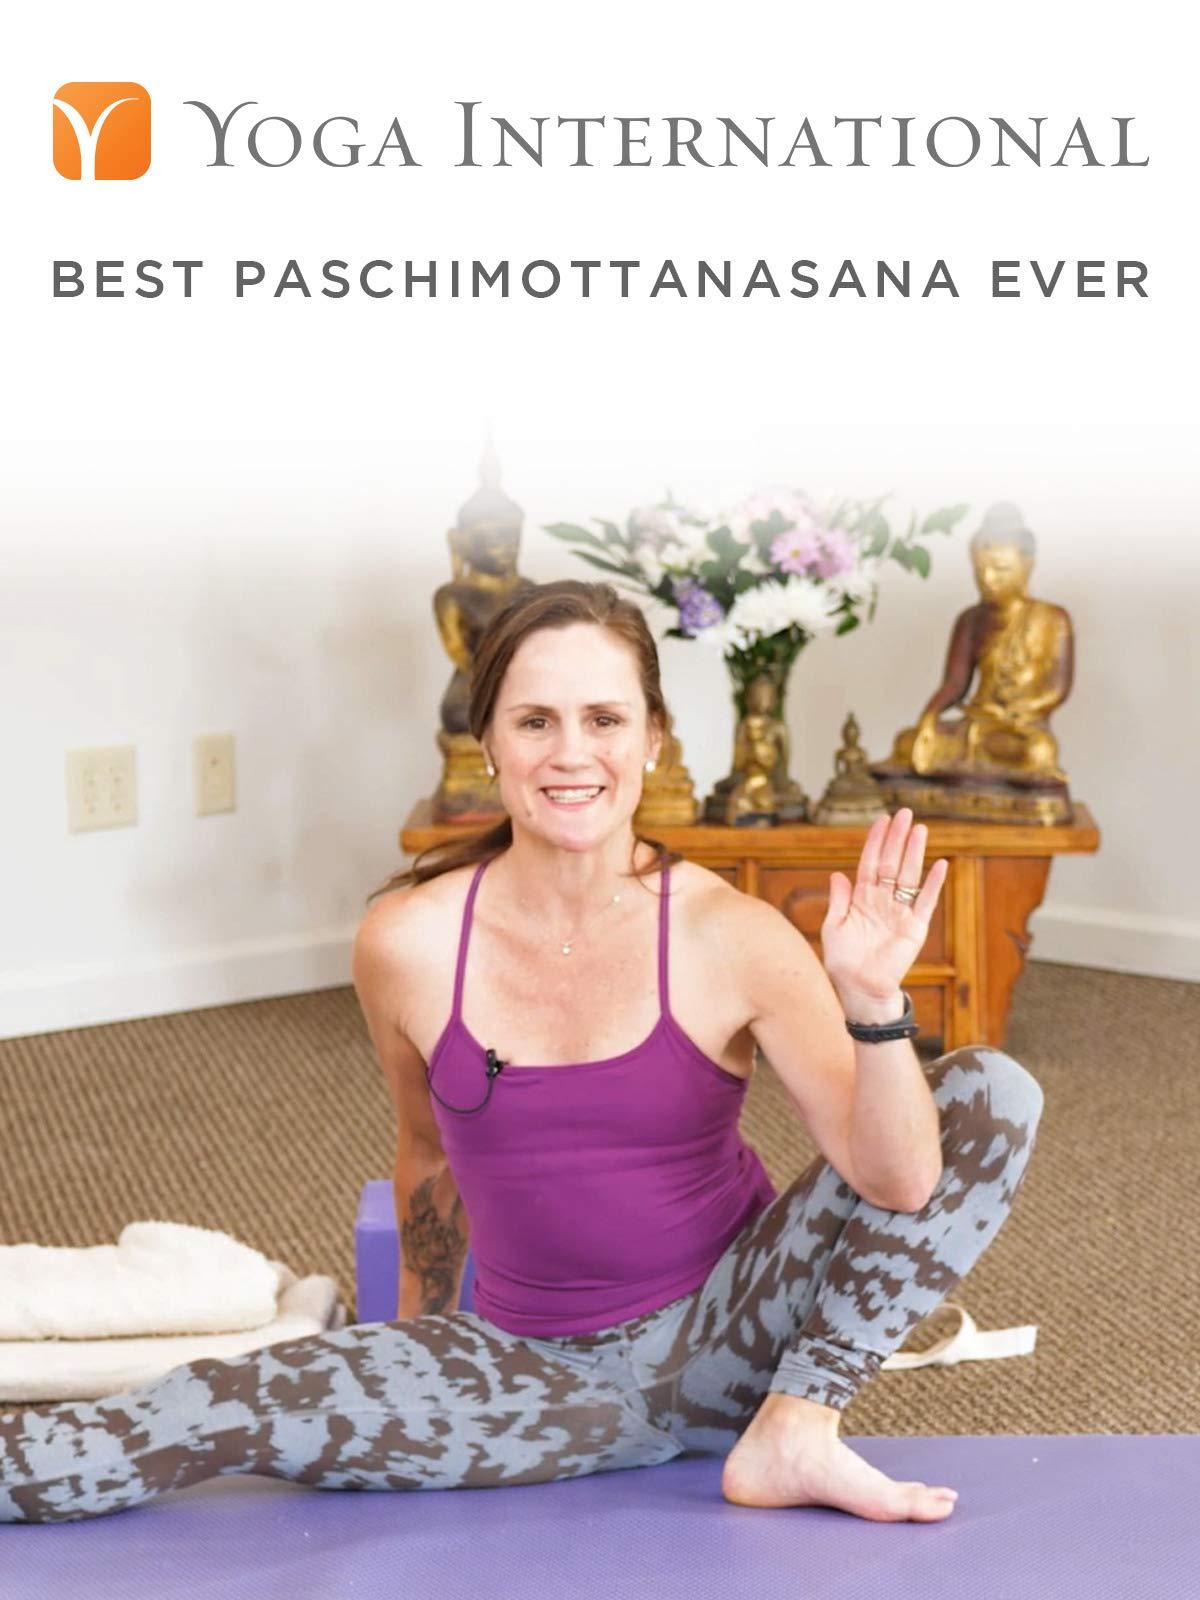 Best Paschimottanasana Ever